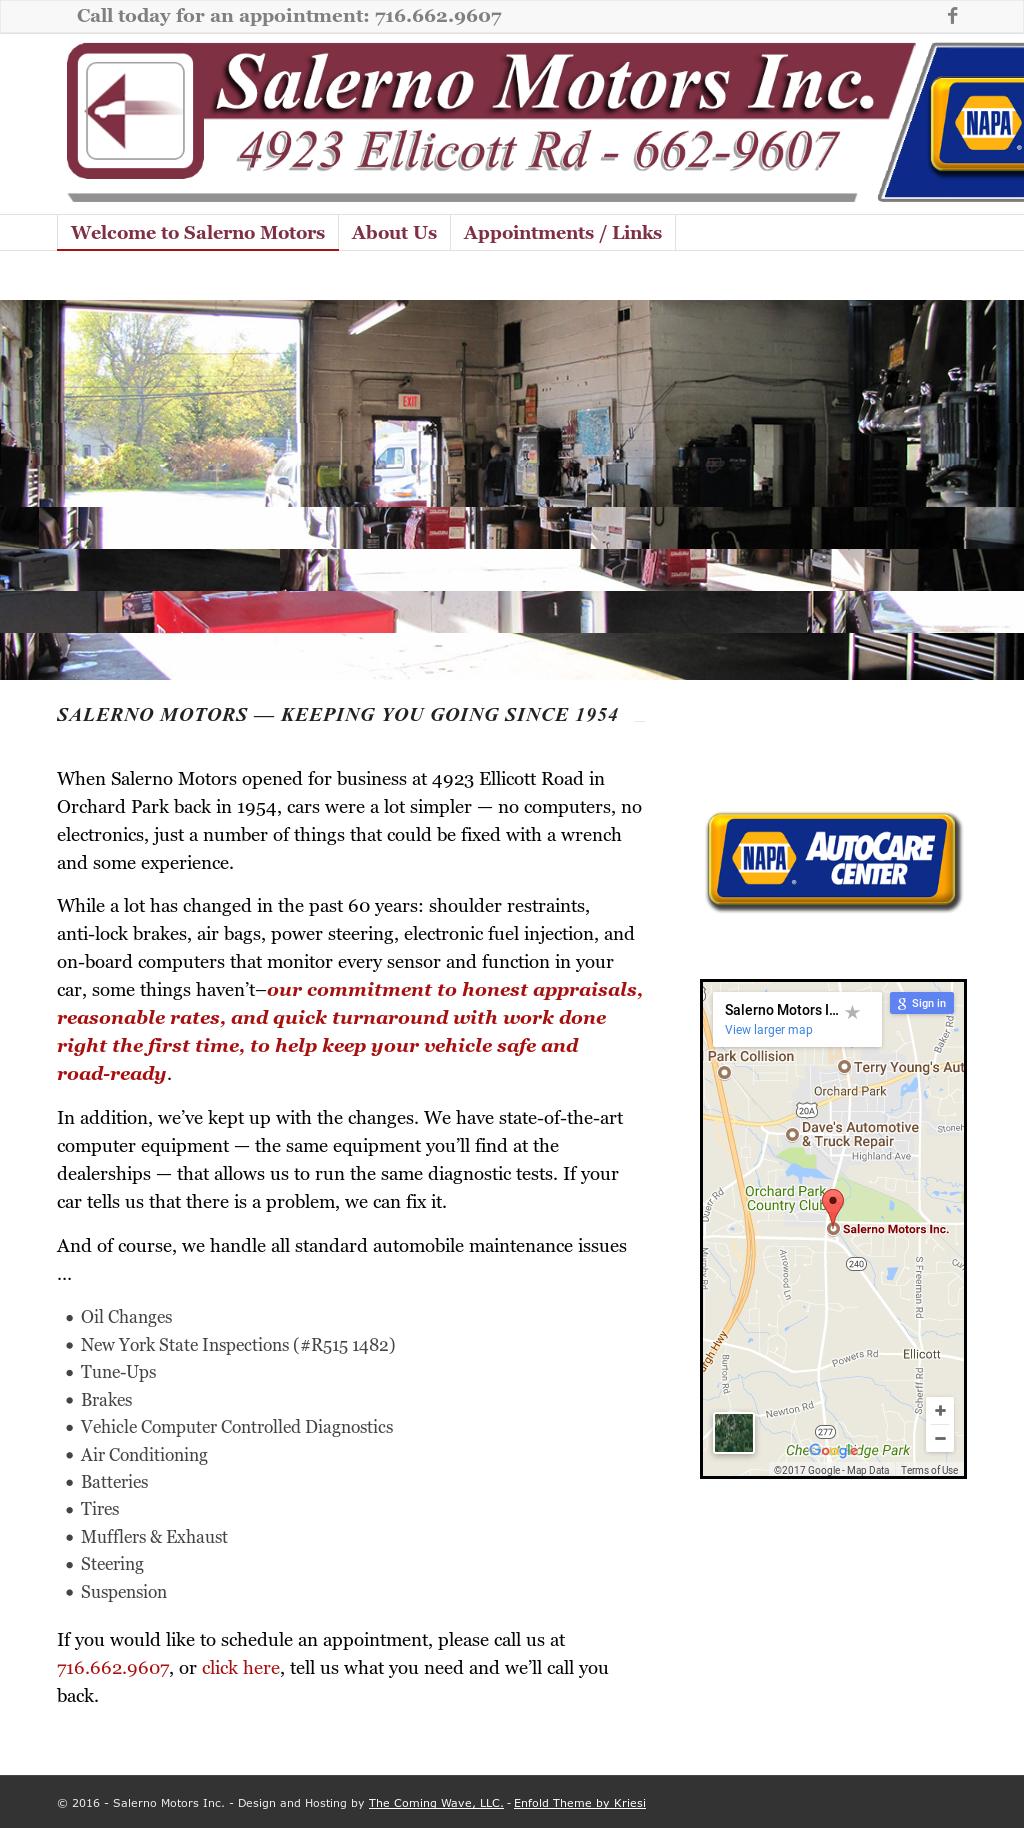 Salerno Motors website history